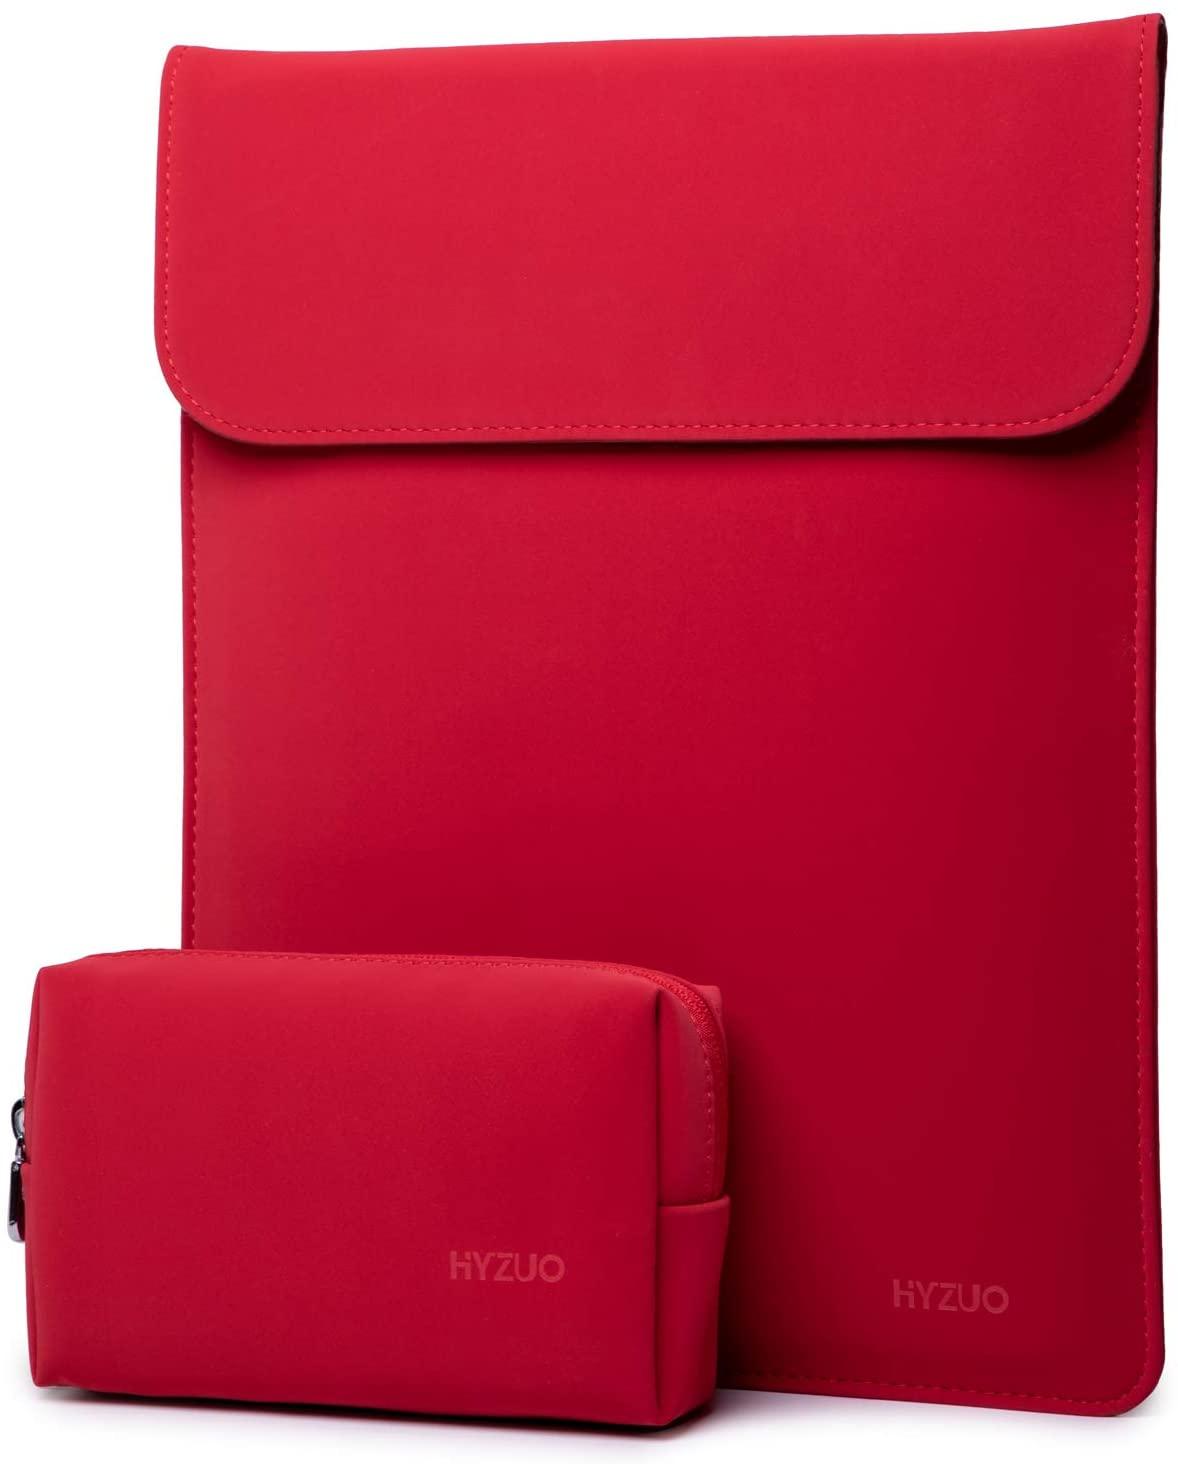 Hyzuo Laptop Sleeve